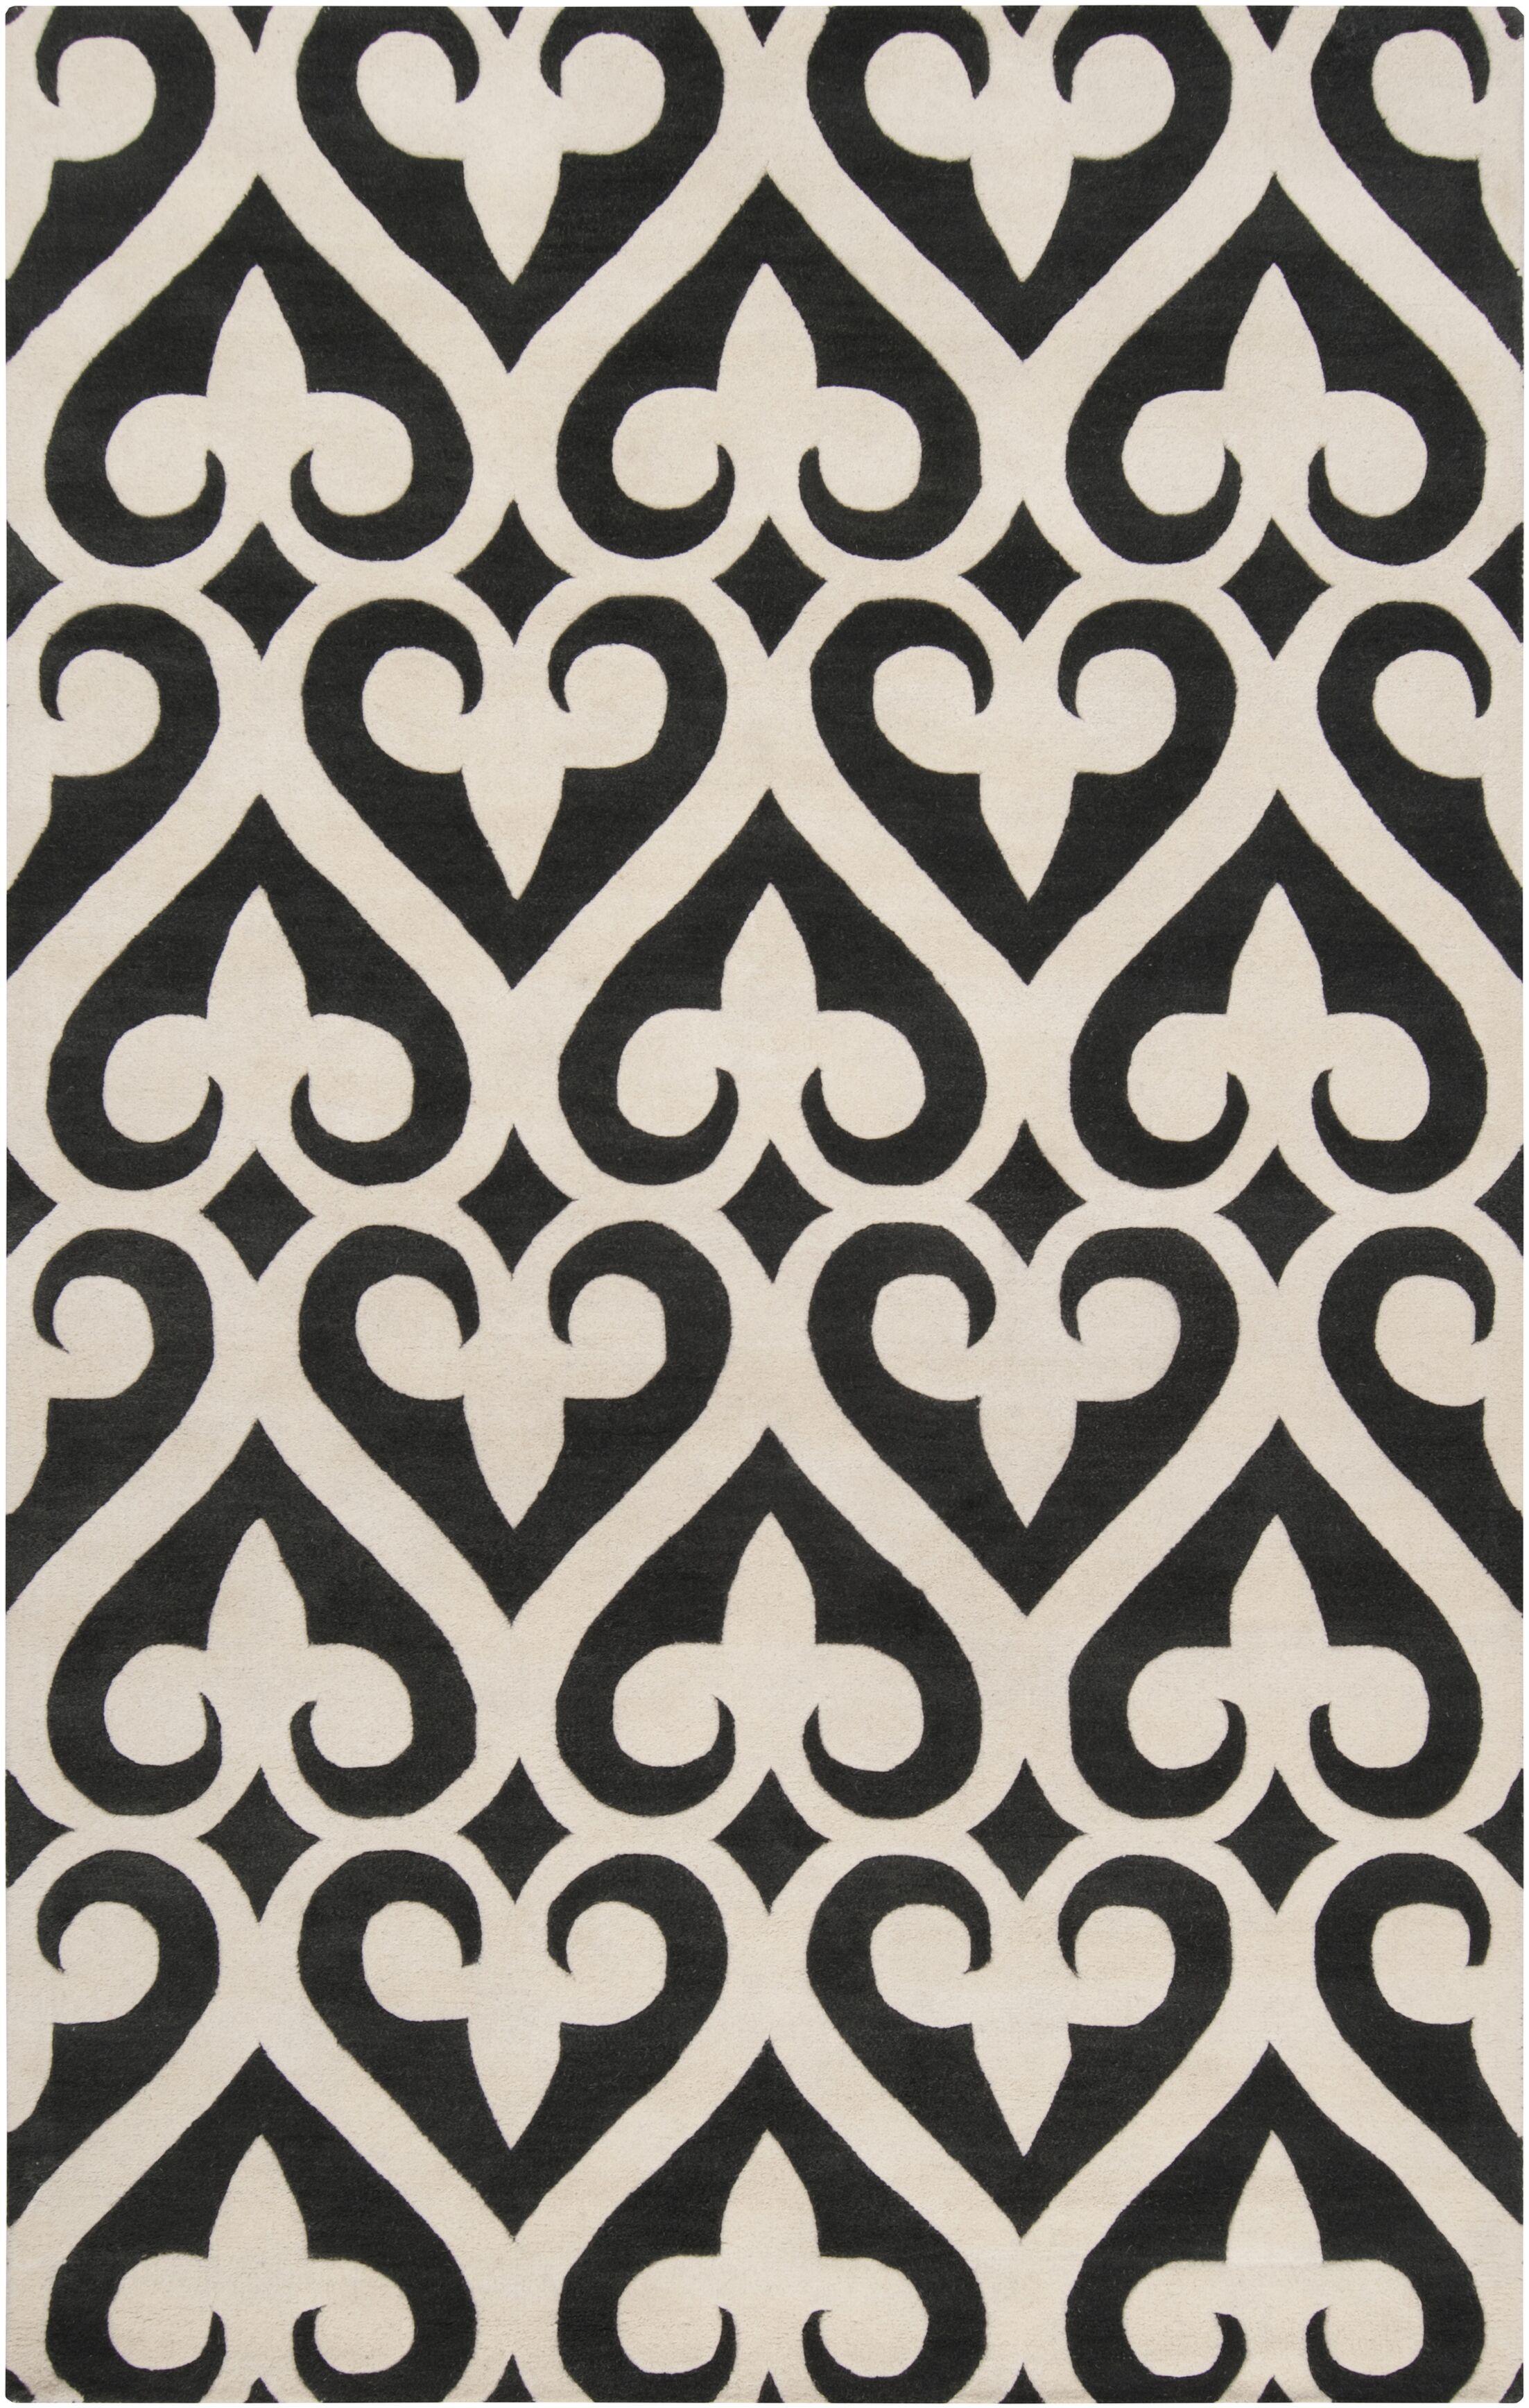 Zuna Geometric Ivory/Black Area Rug Rug Size: Rectangle 9' x 13'